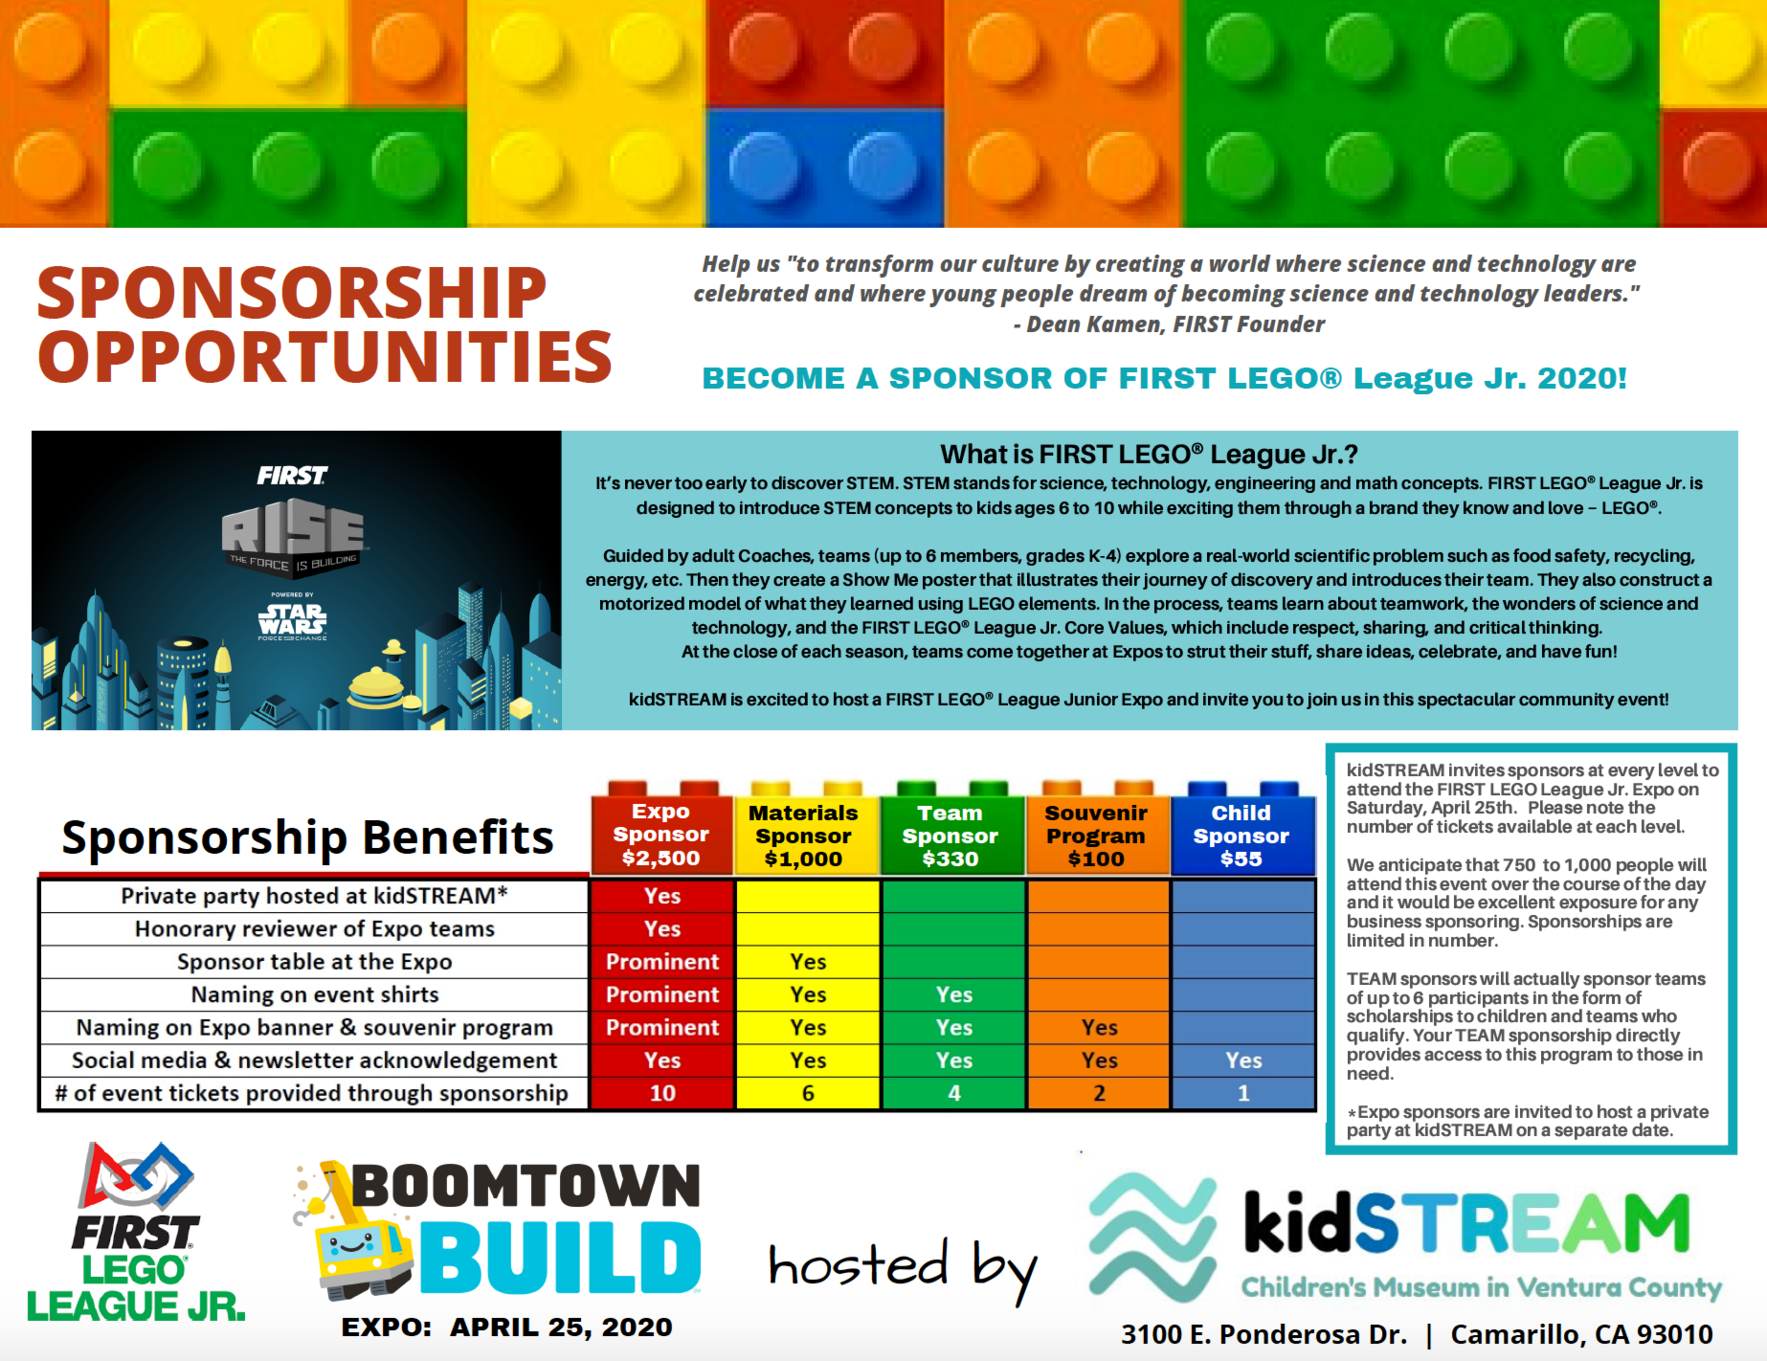 FIRST LEGO League Jr 2020 - Sponsorship image